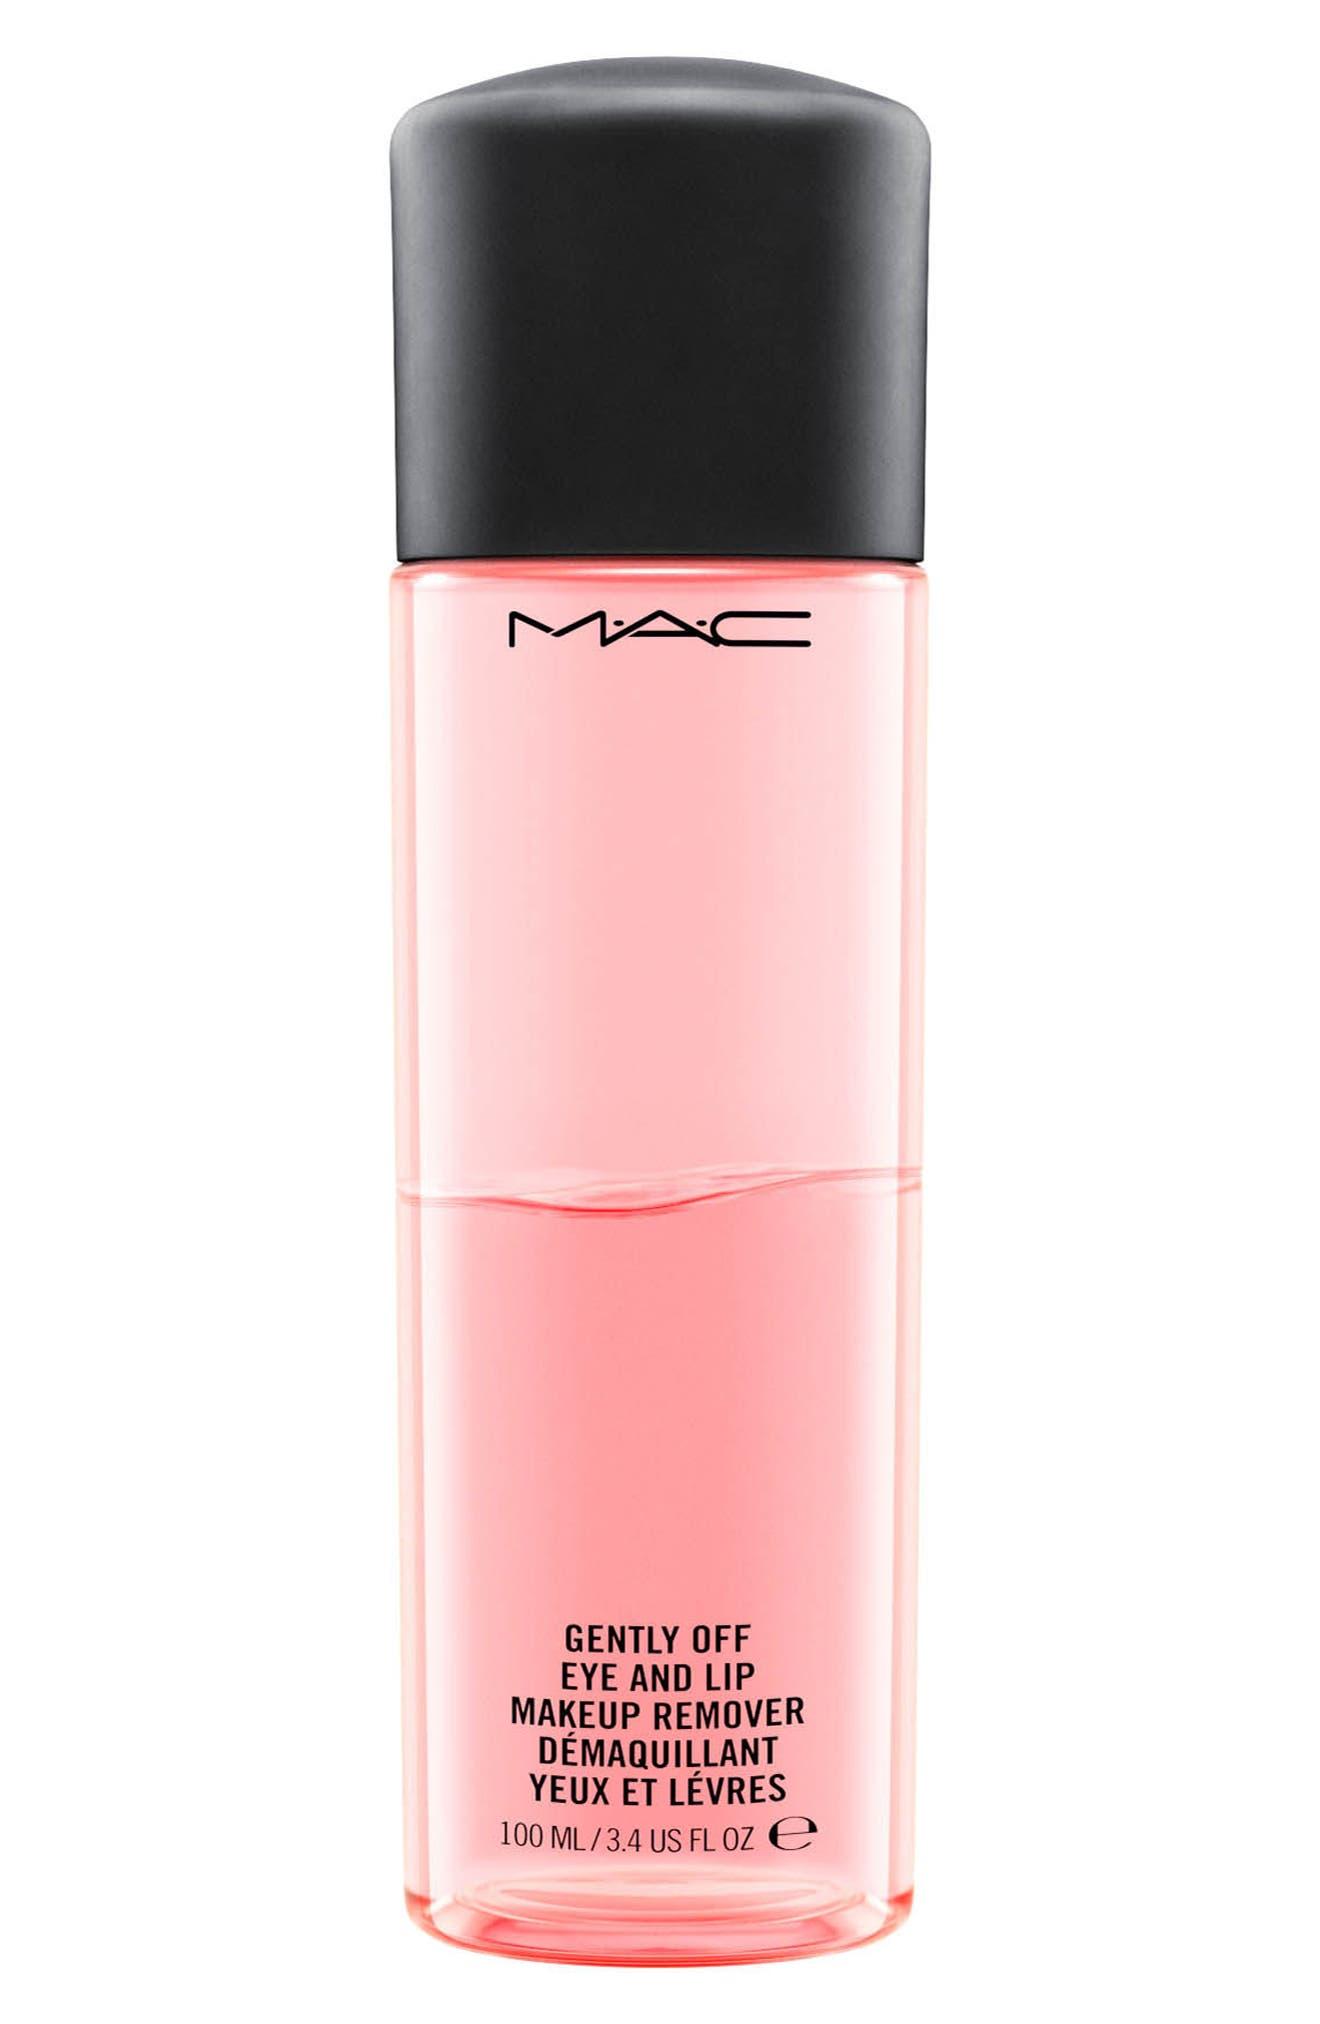 MAC Gently Off Eye & Lip Makeup Remover